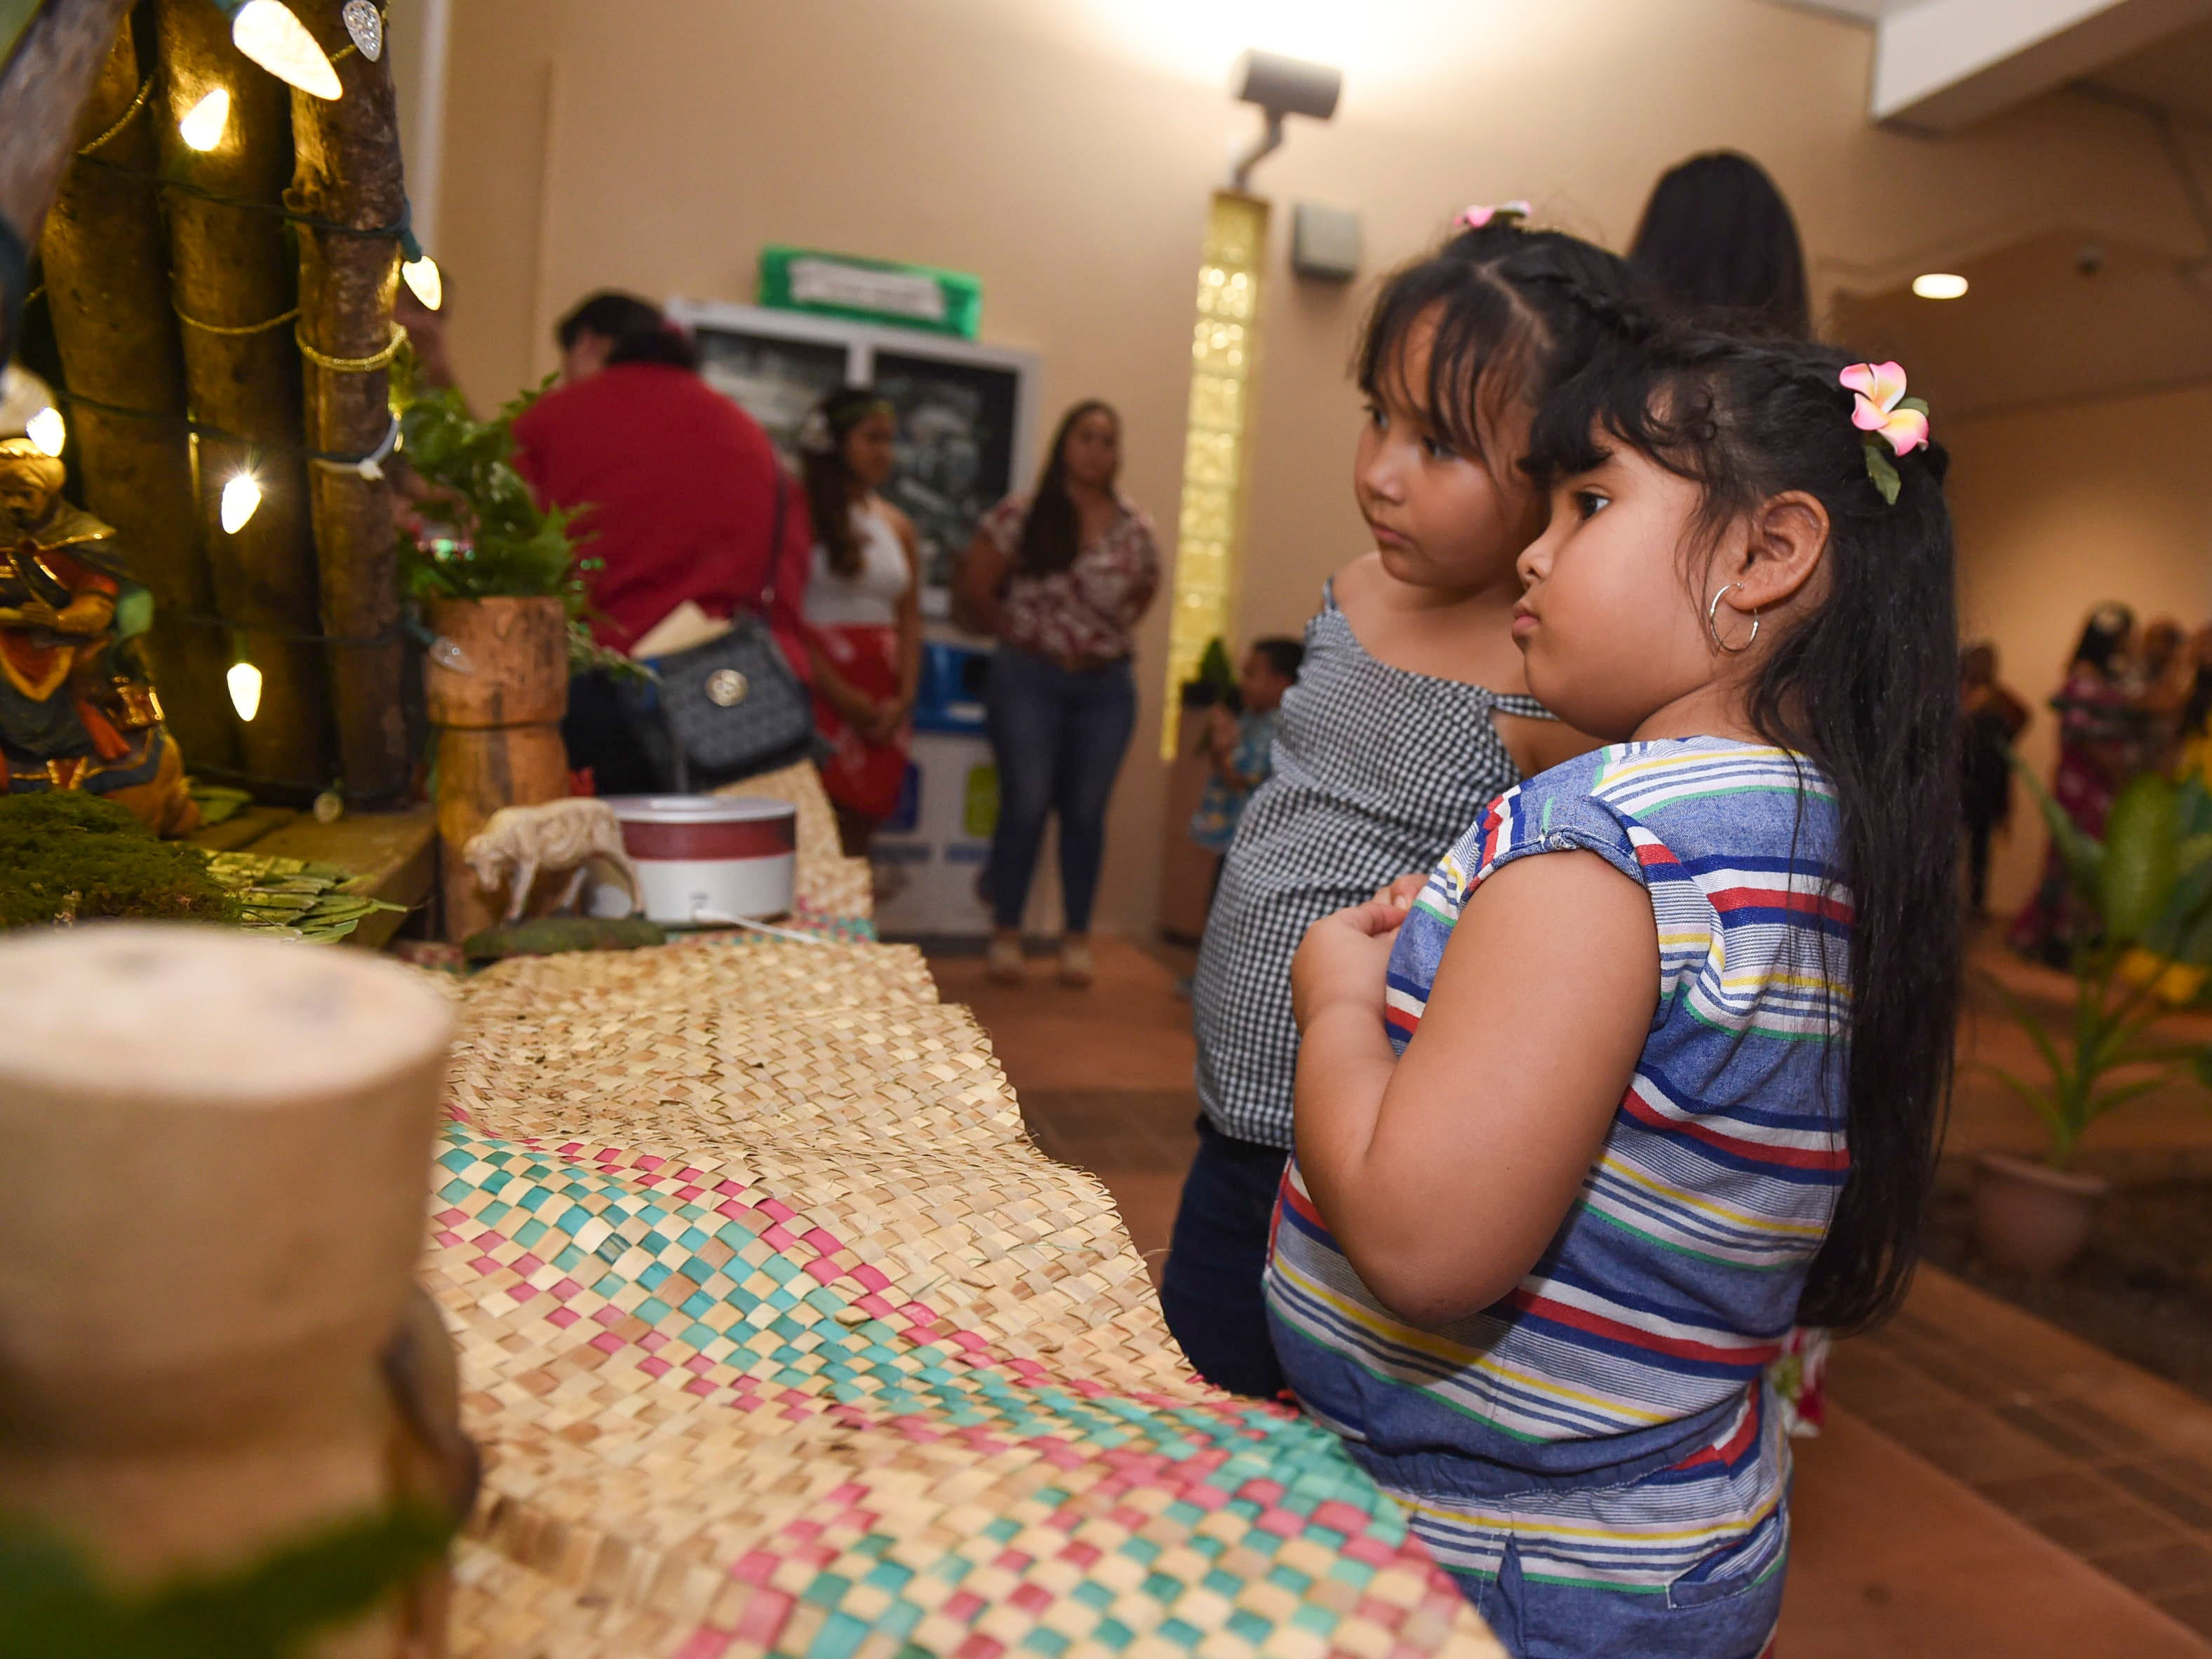 Araiah Diaz, 5, and Aleeah Diaz, 7, admire a bilen during the University of Guam Chamorro Studies Program's 2018 Christmas Celebration, Puengen Minagof Noche Buena! at the UOG Humanities and Social Sciences Building on Nov. 30, 2018.